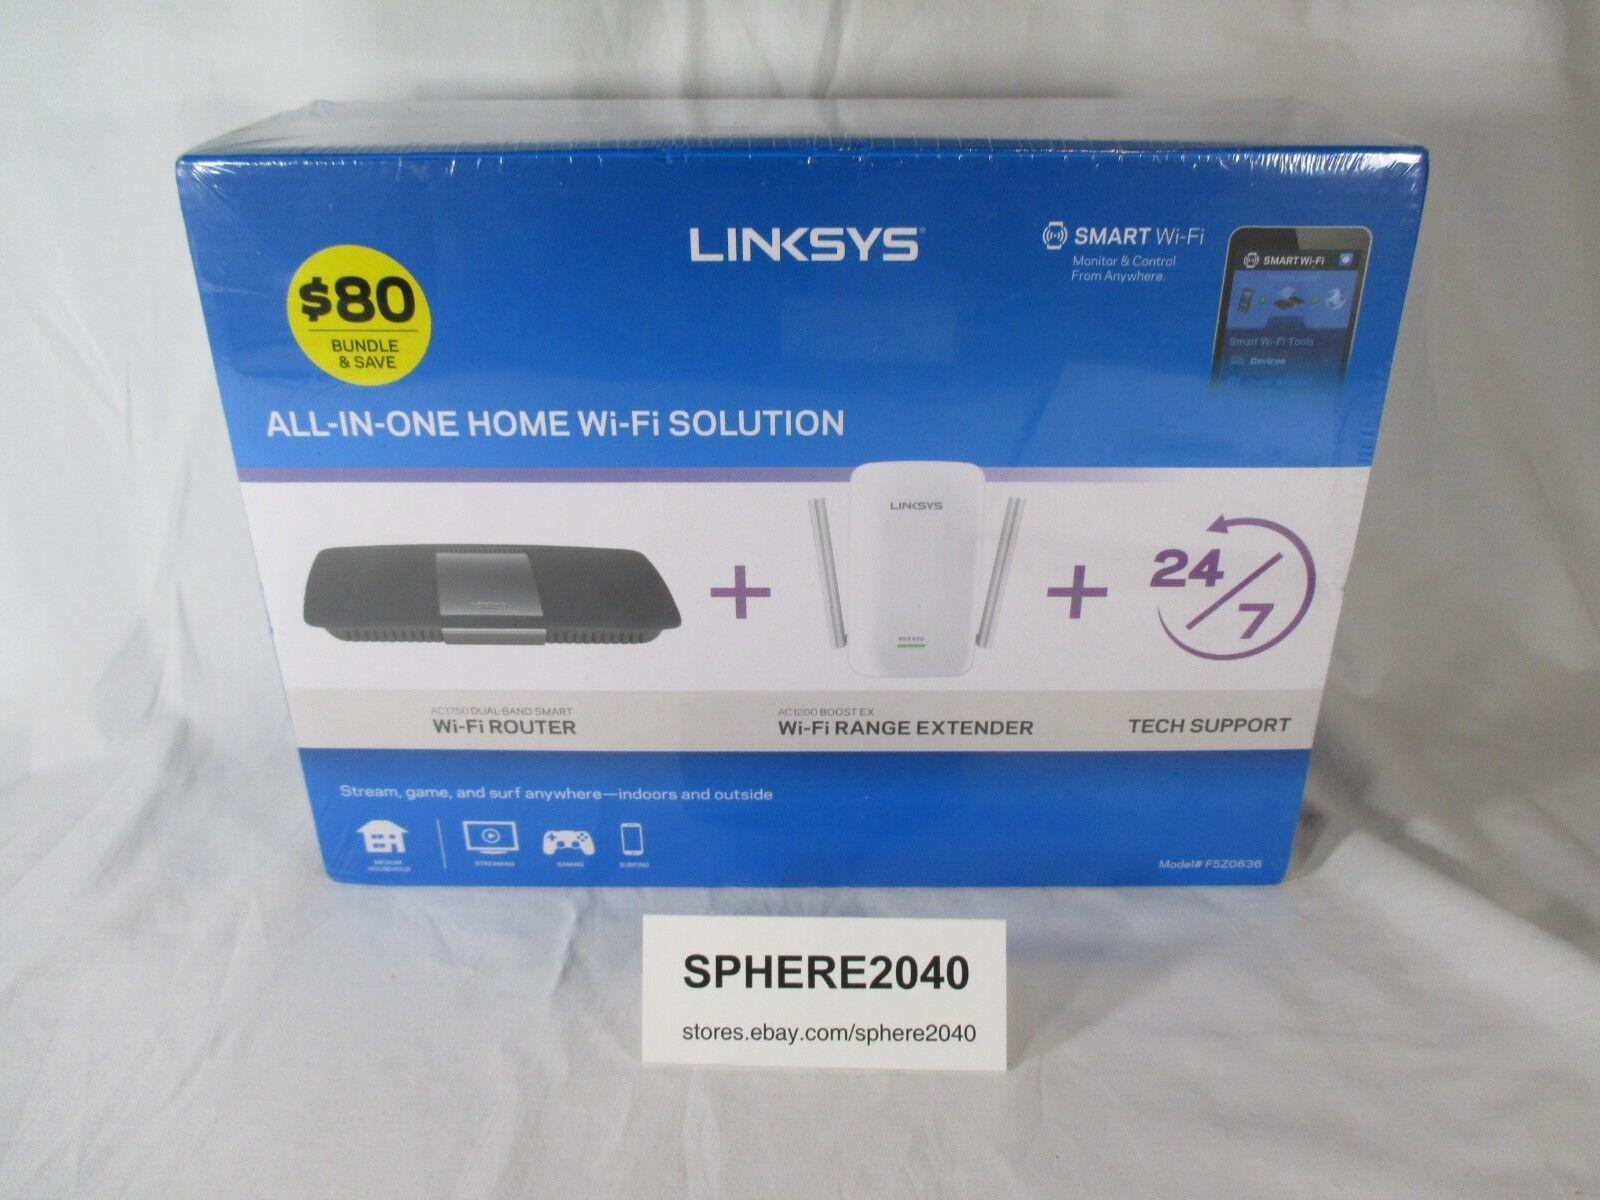 NEW Linksys AC1750 Dual-Band Smart Wireless Router w/ Range